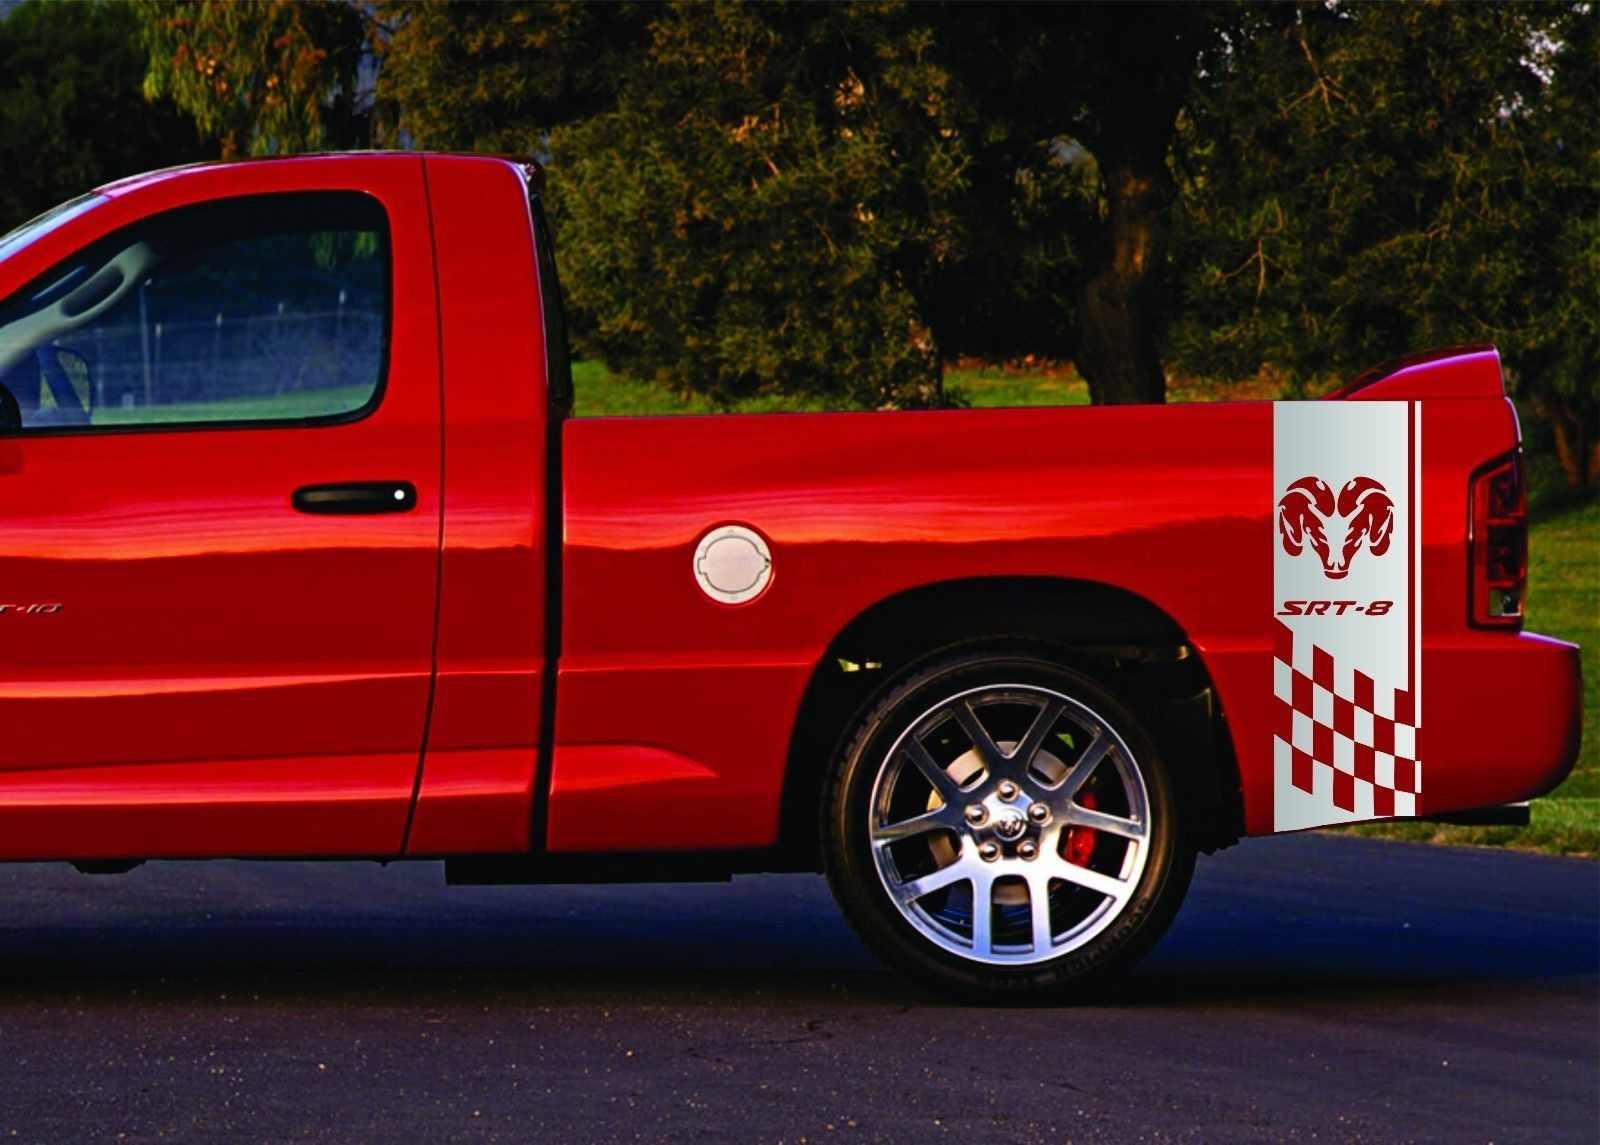 For 2 Truck Vinyl Sticker Decals Bed Stripes Dodge Ram 1500 Rt Mopar Rebel Hemi Srt8 Car Stickers Aliexpress